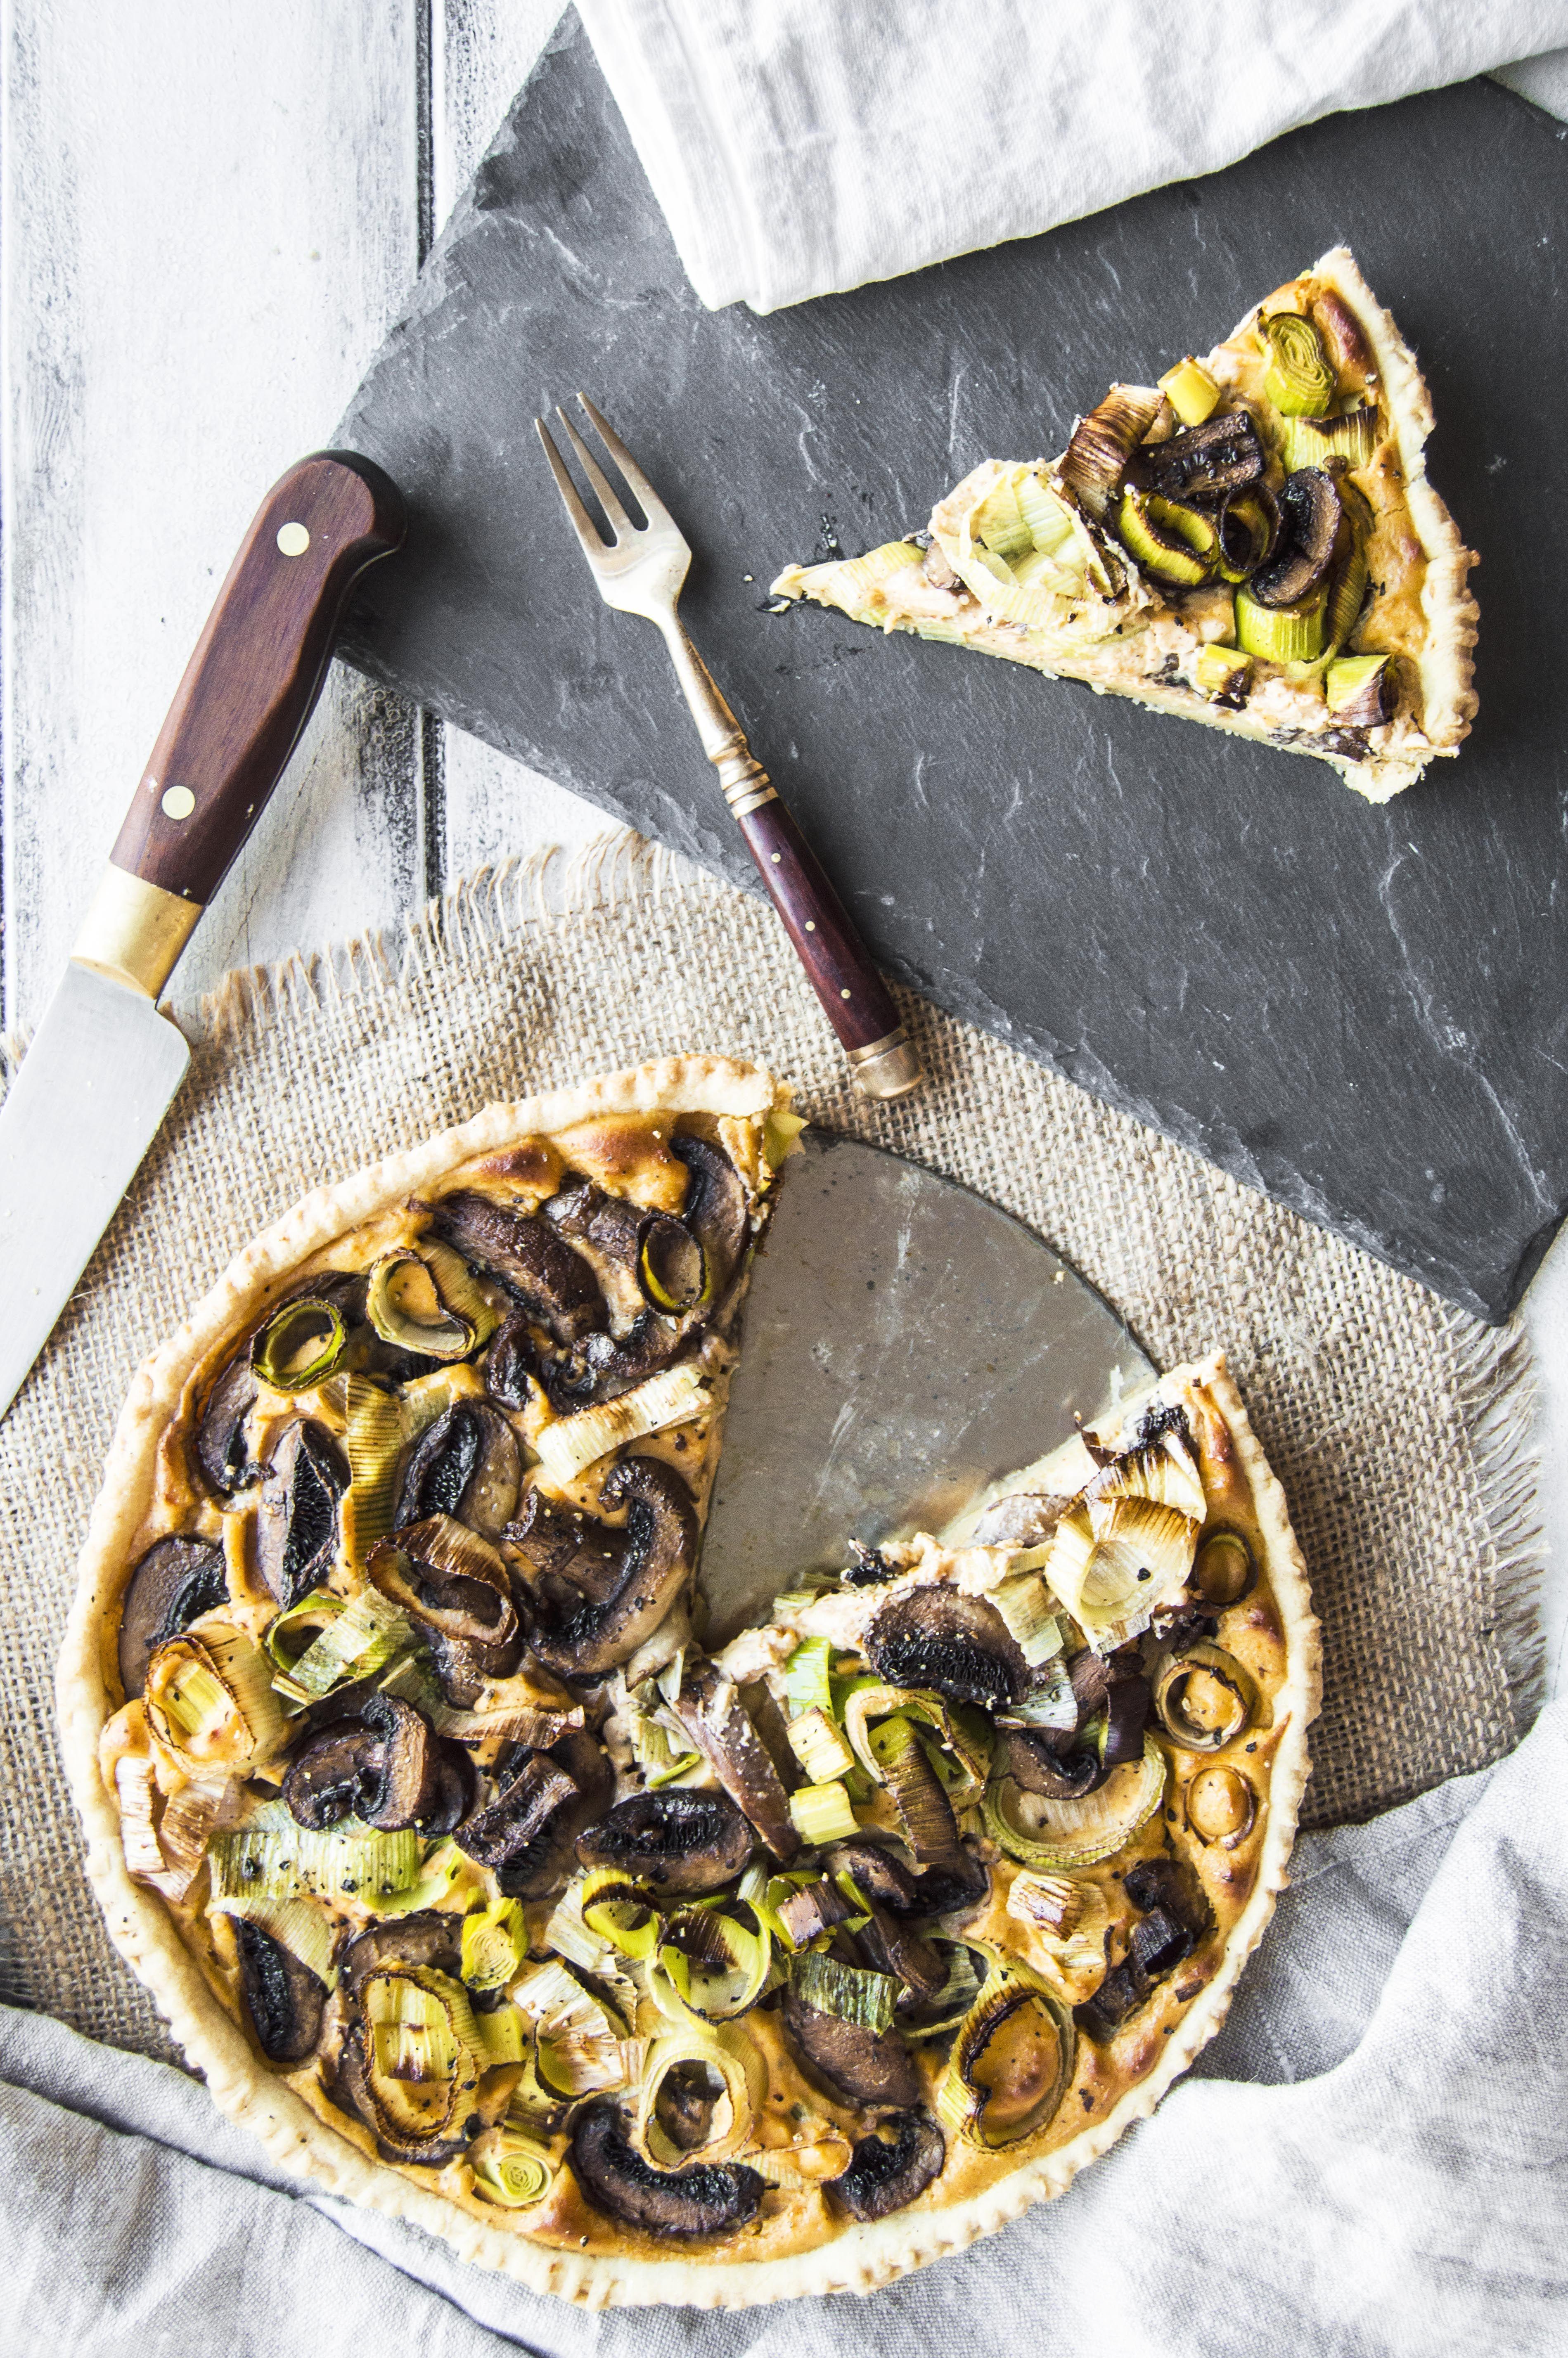 My Vibrant Kitchen | Vegan Mushroom Leek and Sweet Potato Tart | http://myvibrantkitchen.com